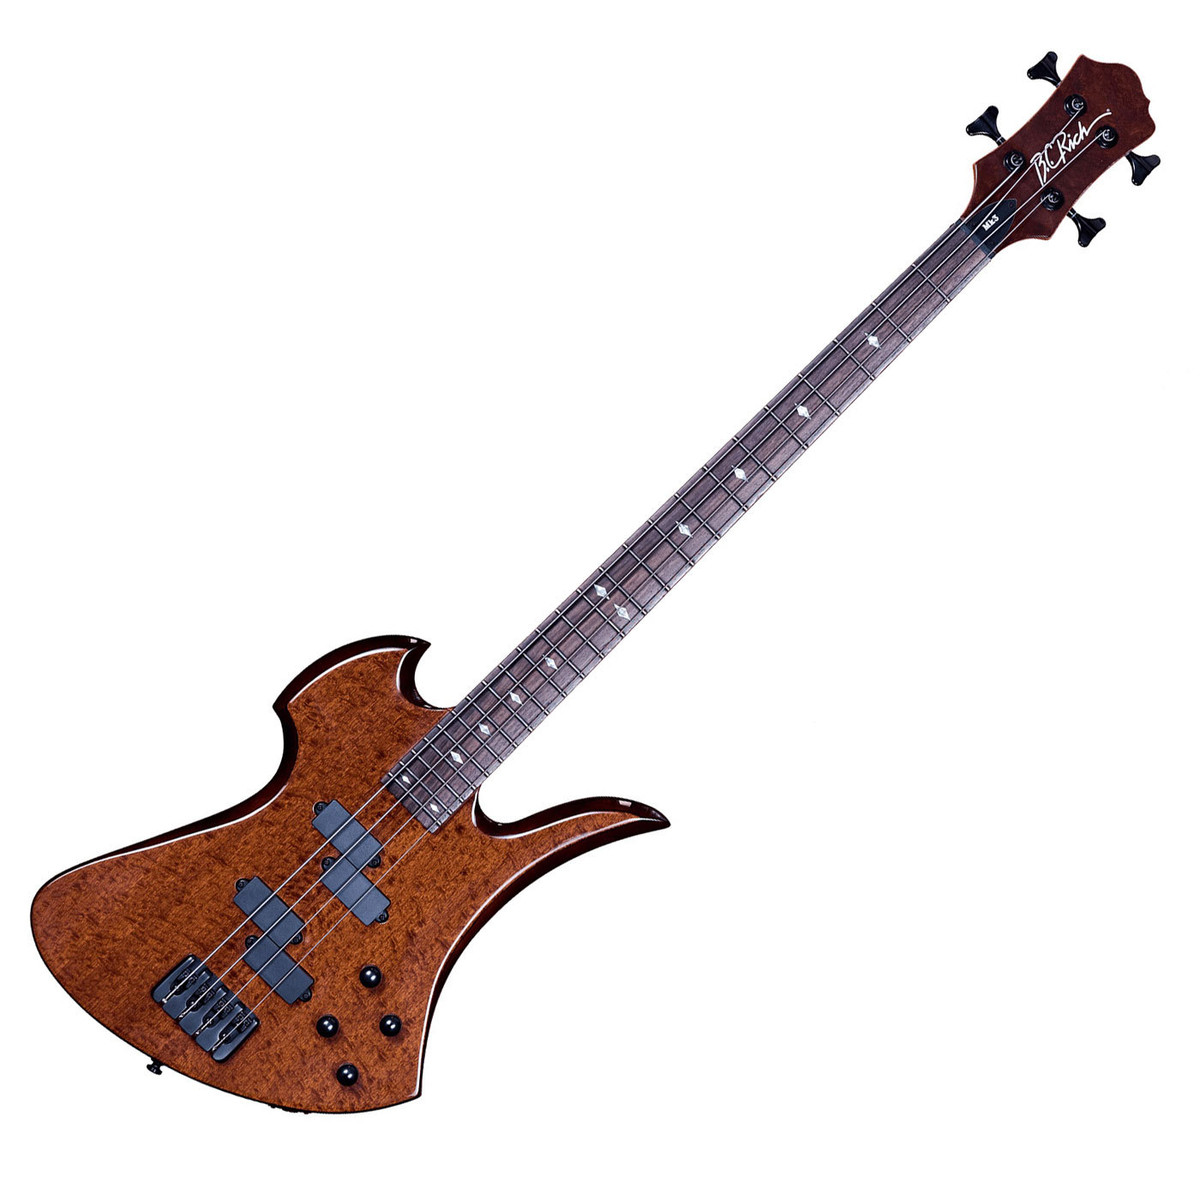 offline bc rich mockingbird mk3 bass quilted mahogany at gear4music. Black Bedroom Furniture Sets. Home Design Ideas